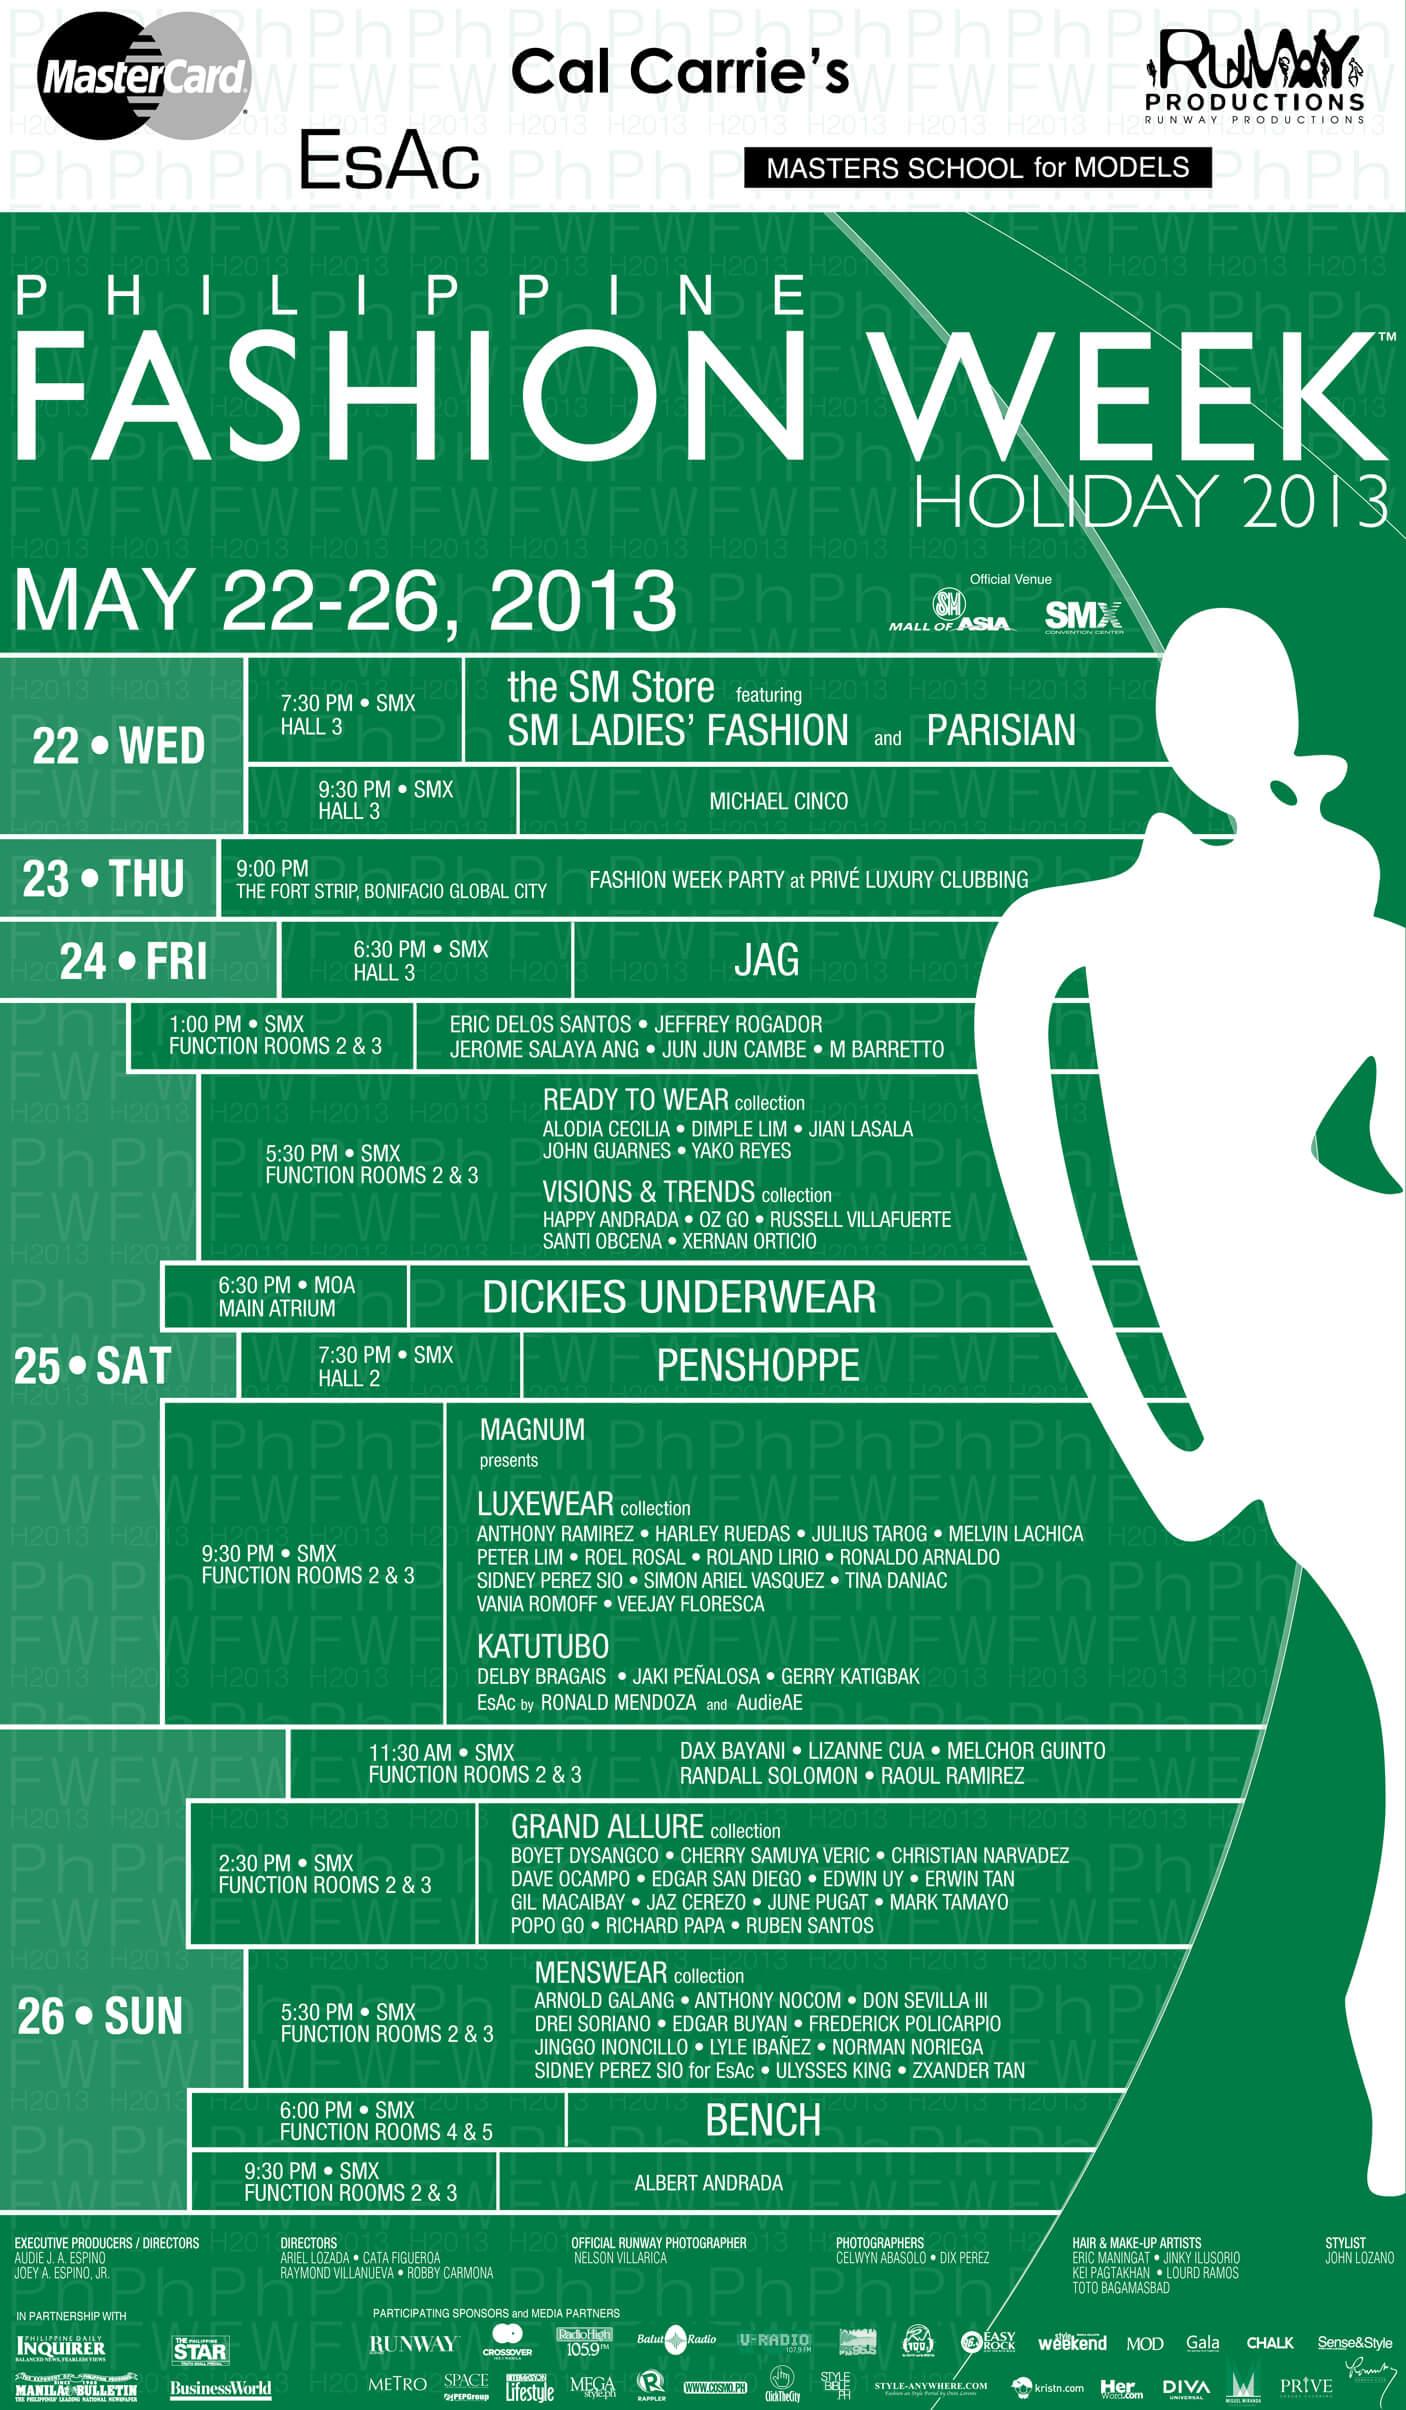 PhFW Holiday 2013 Show Schedule.jpg